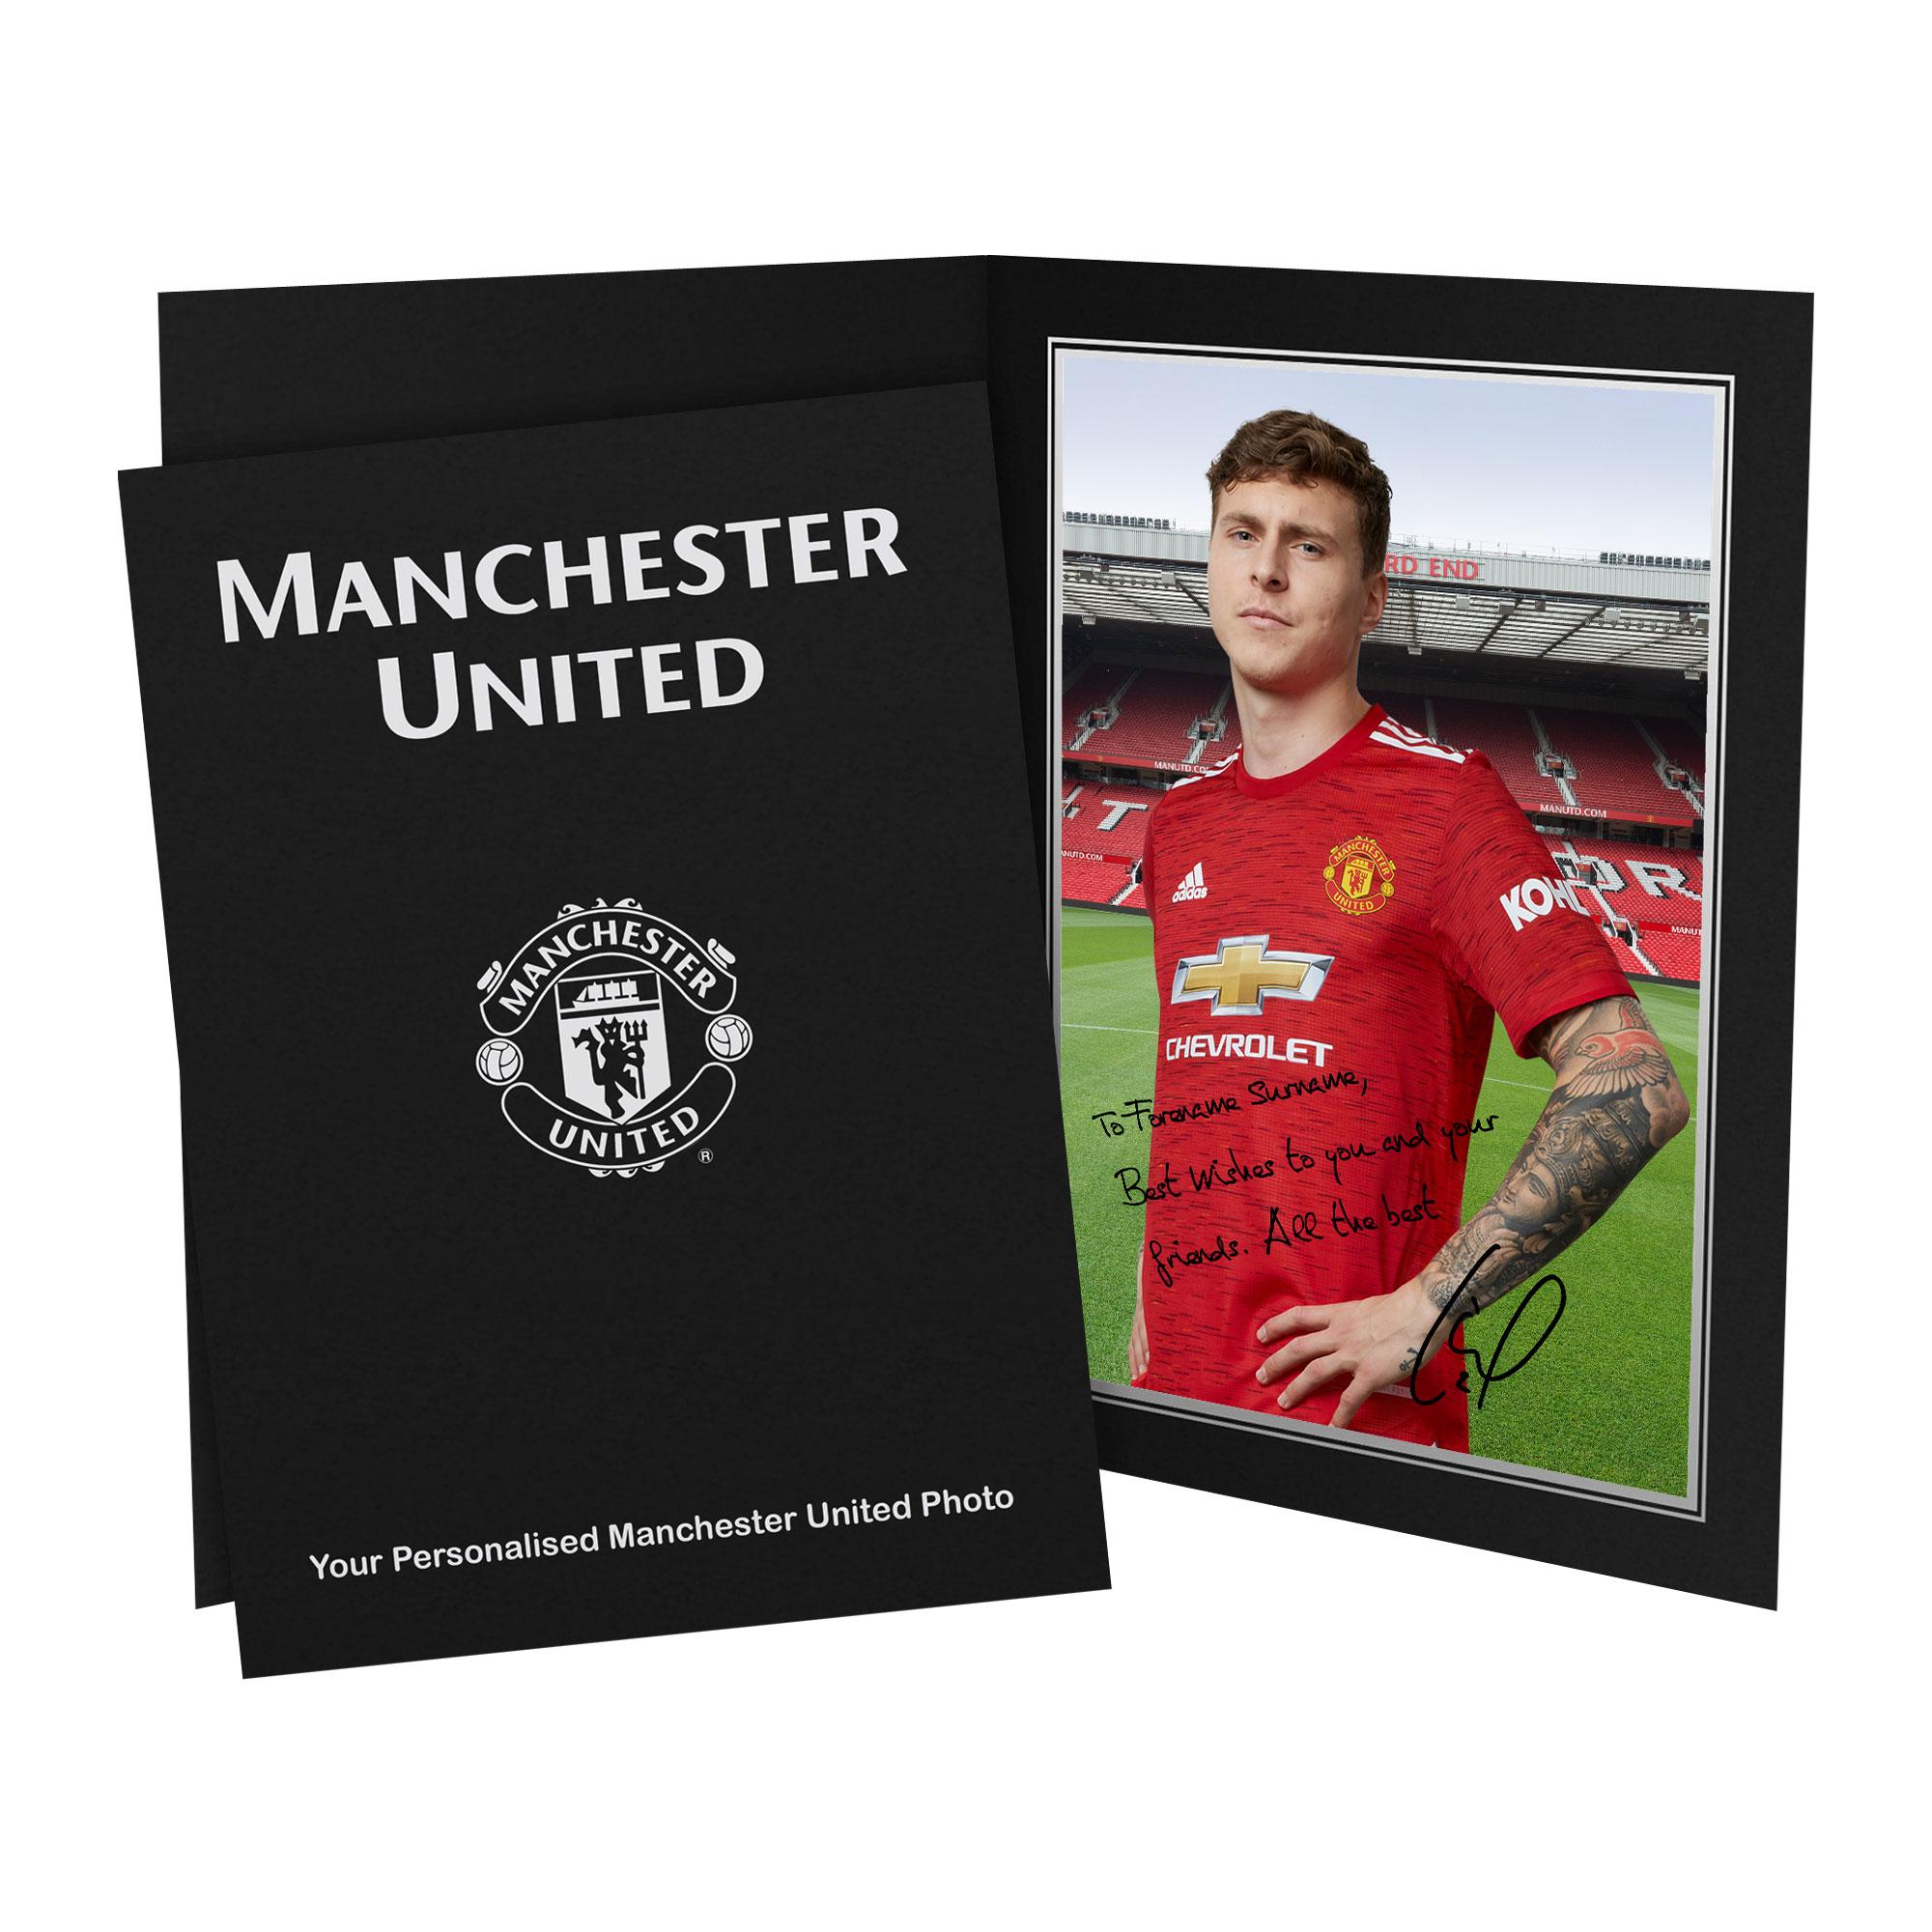 Manchester United FC Lindelof Autograph Photo Folder